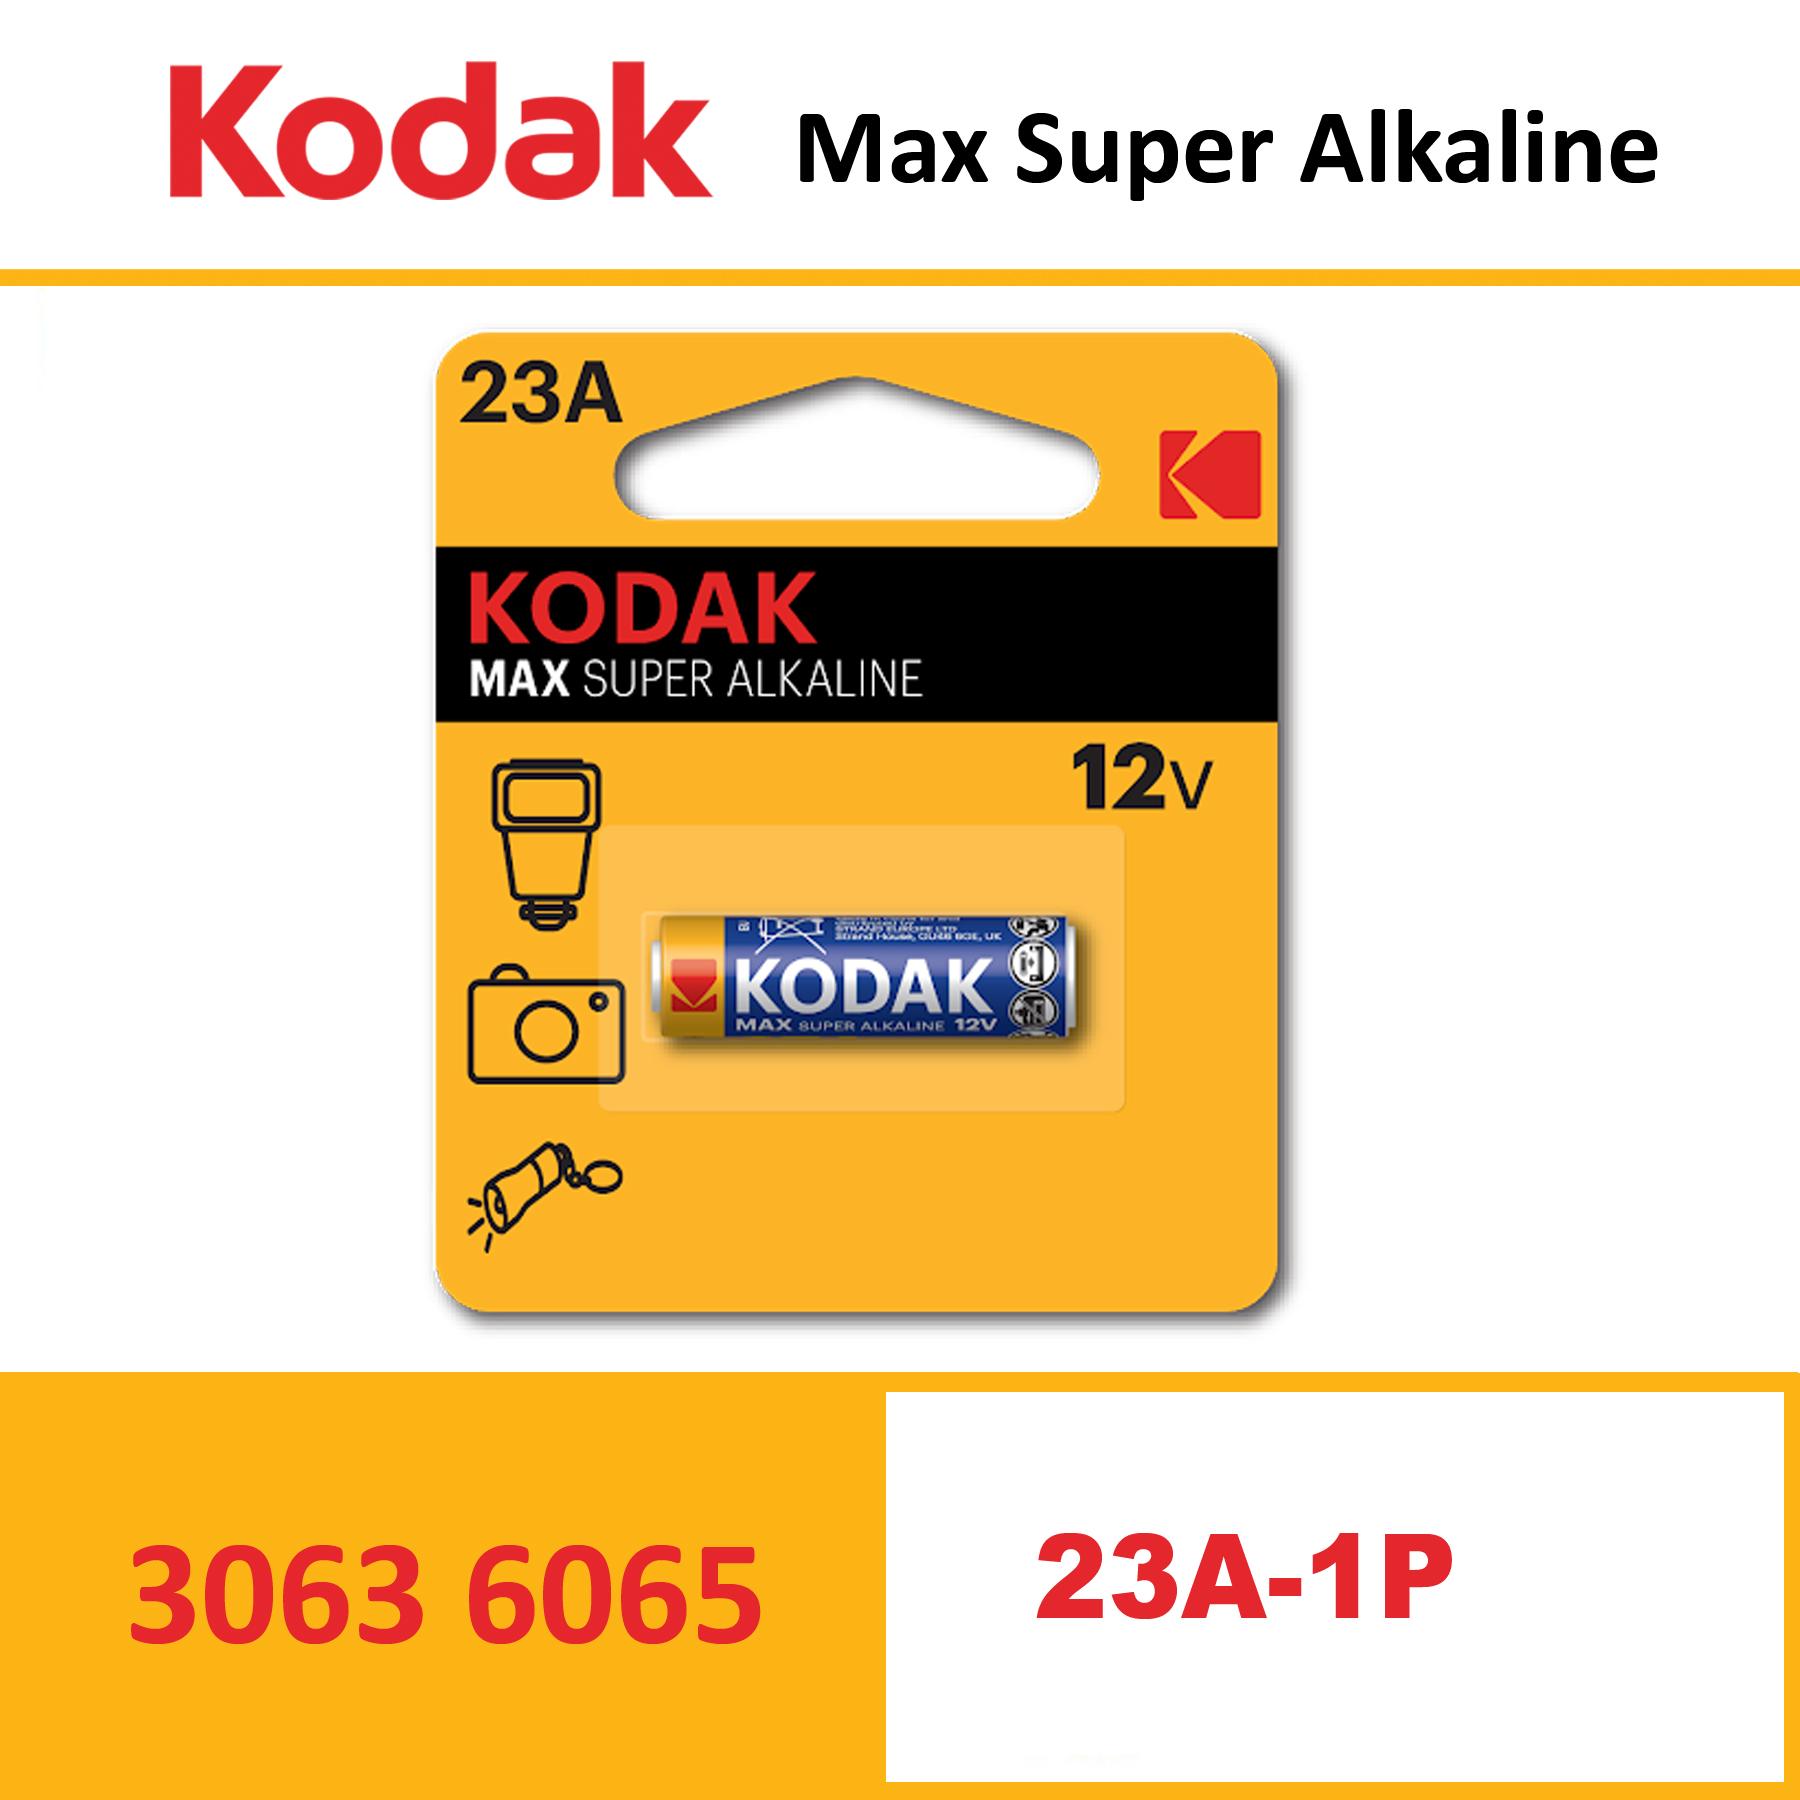 KODAK K23A MAX SUPER Alkaline battery